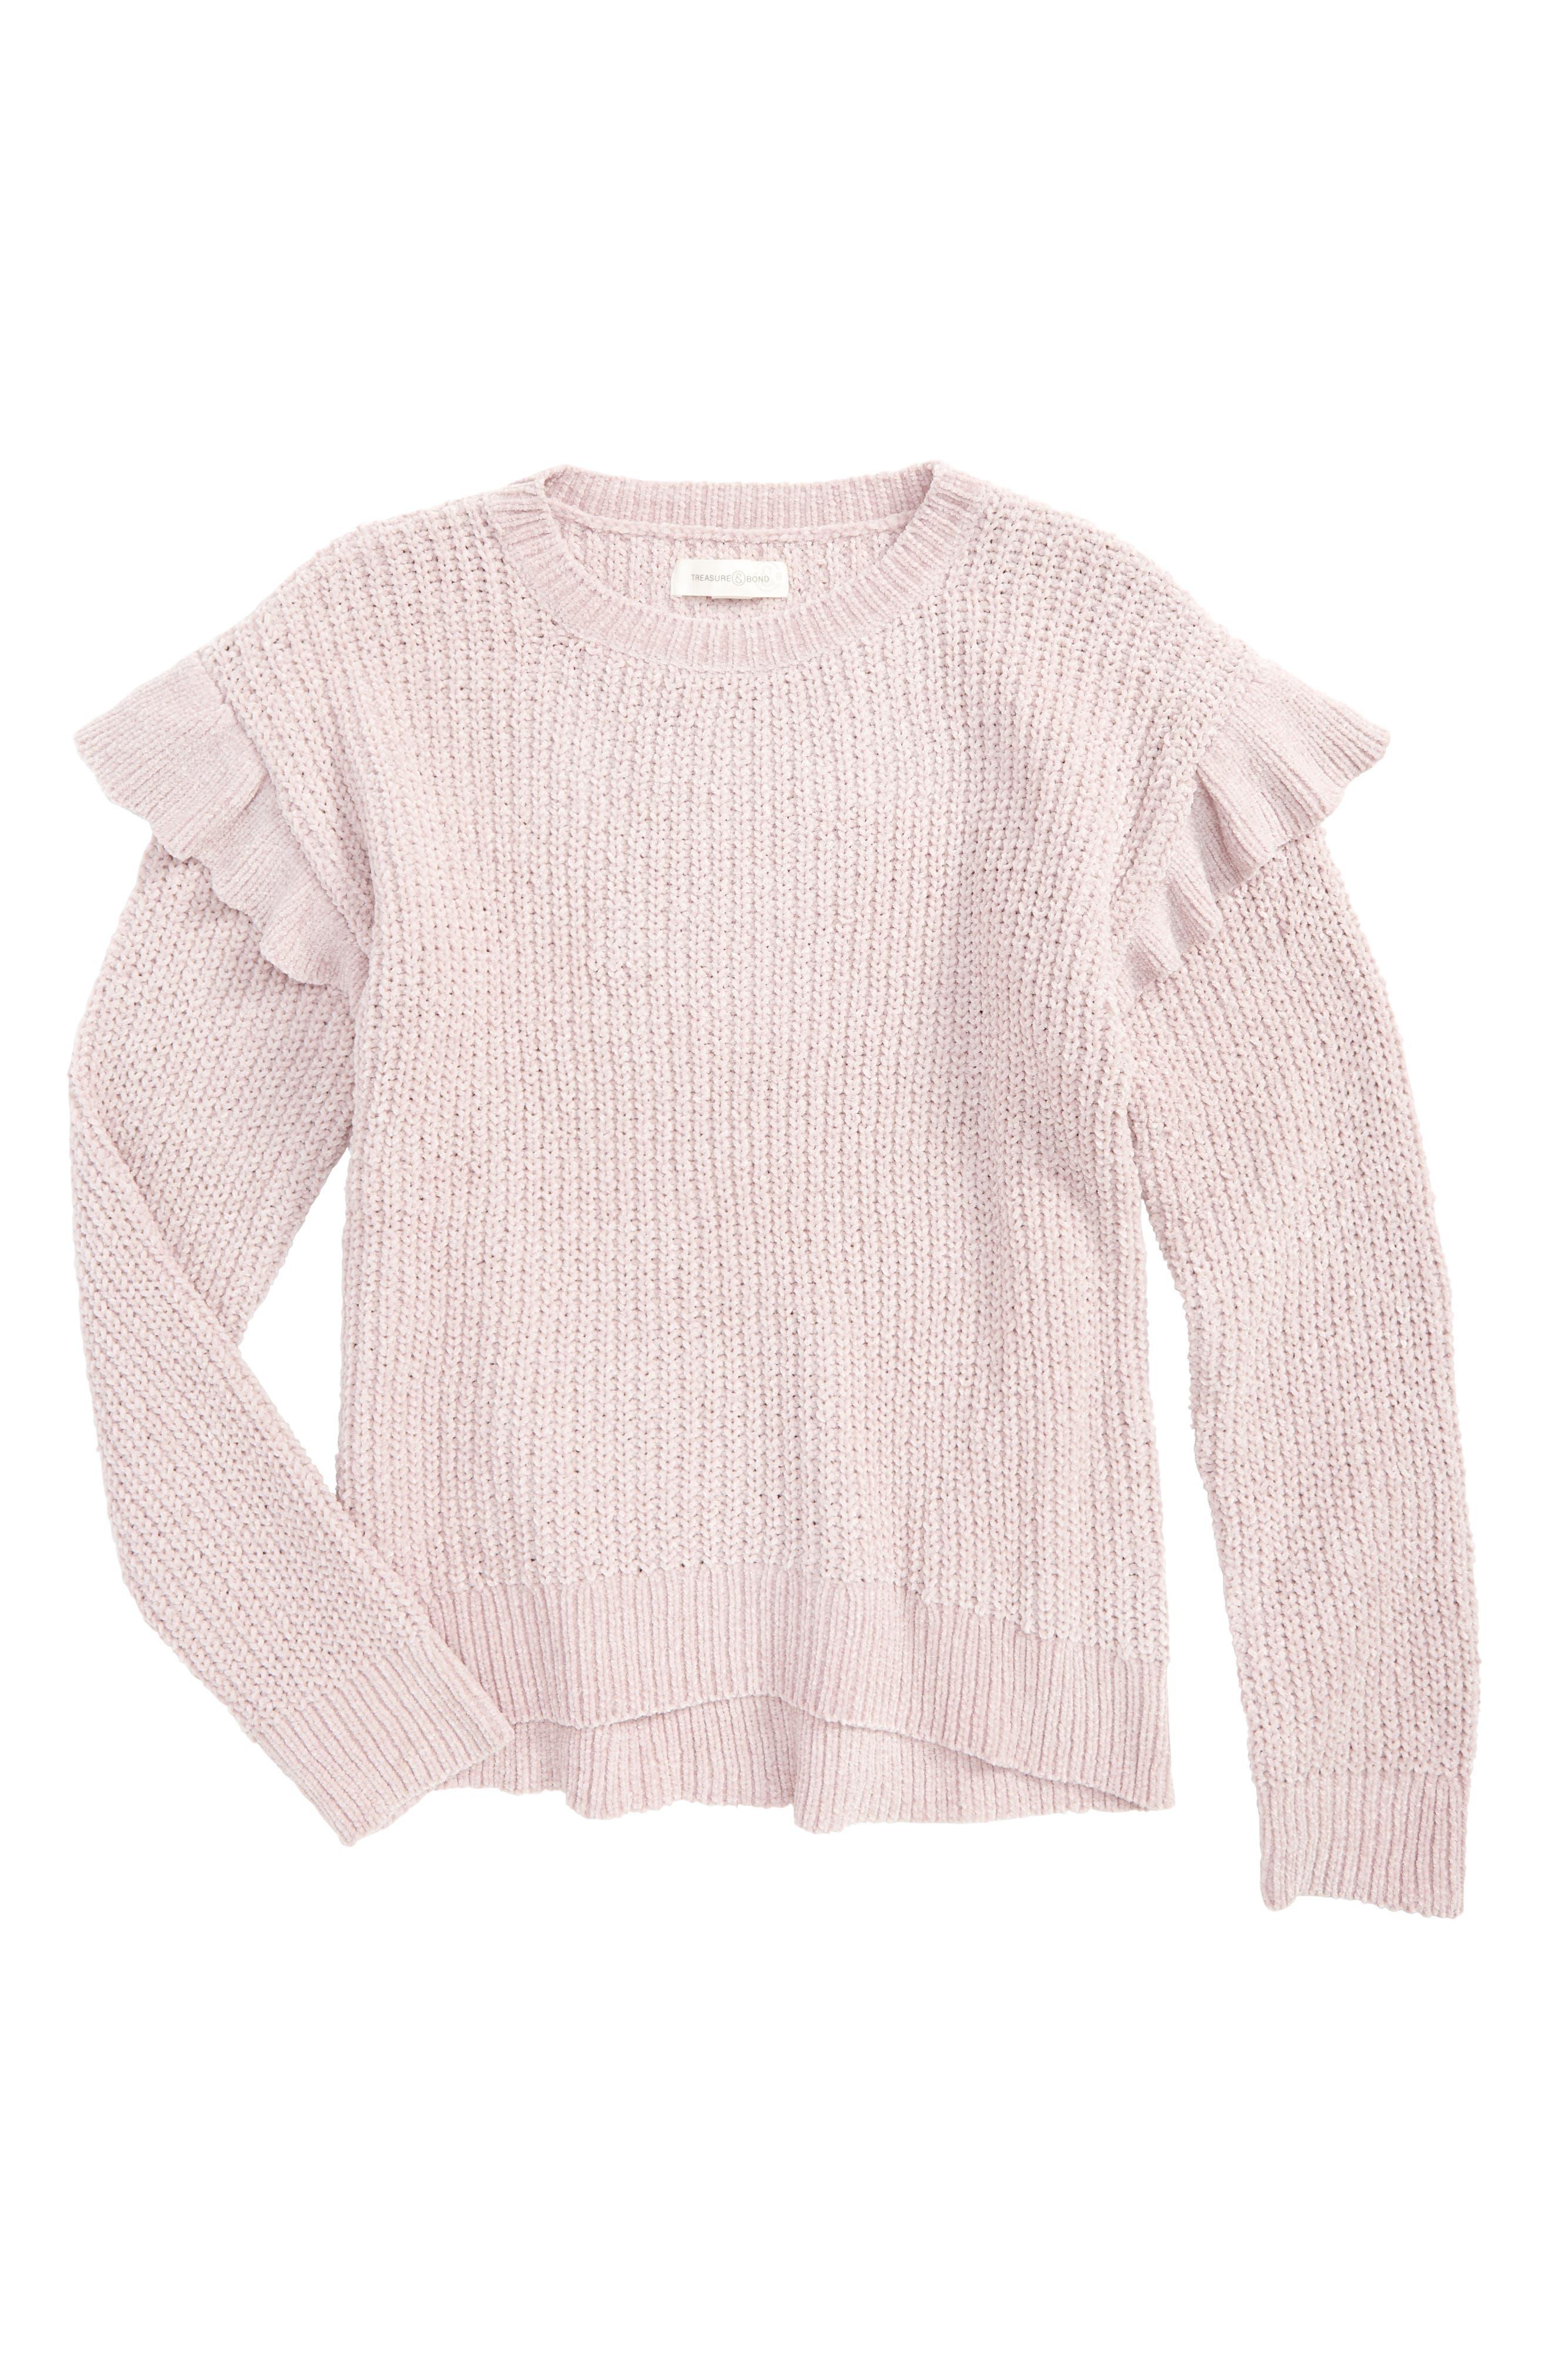 Alternate Image 1 Selected - Treasure & Bond Ruffle Sweater (Big Girls)